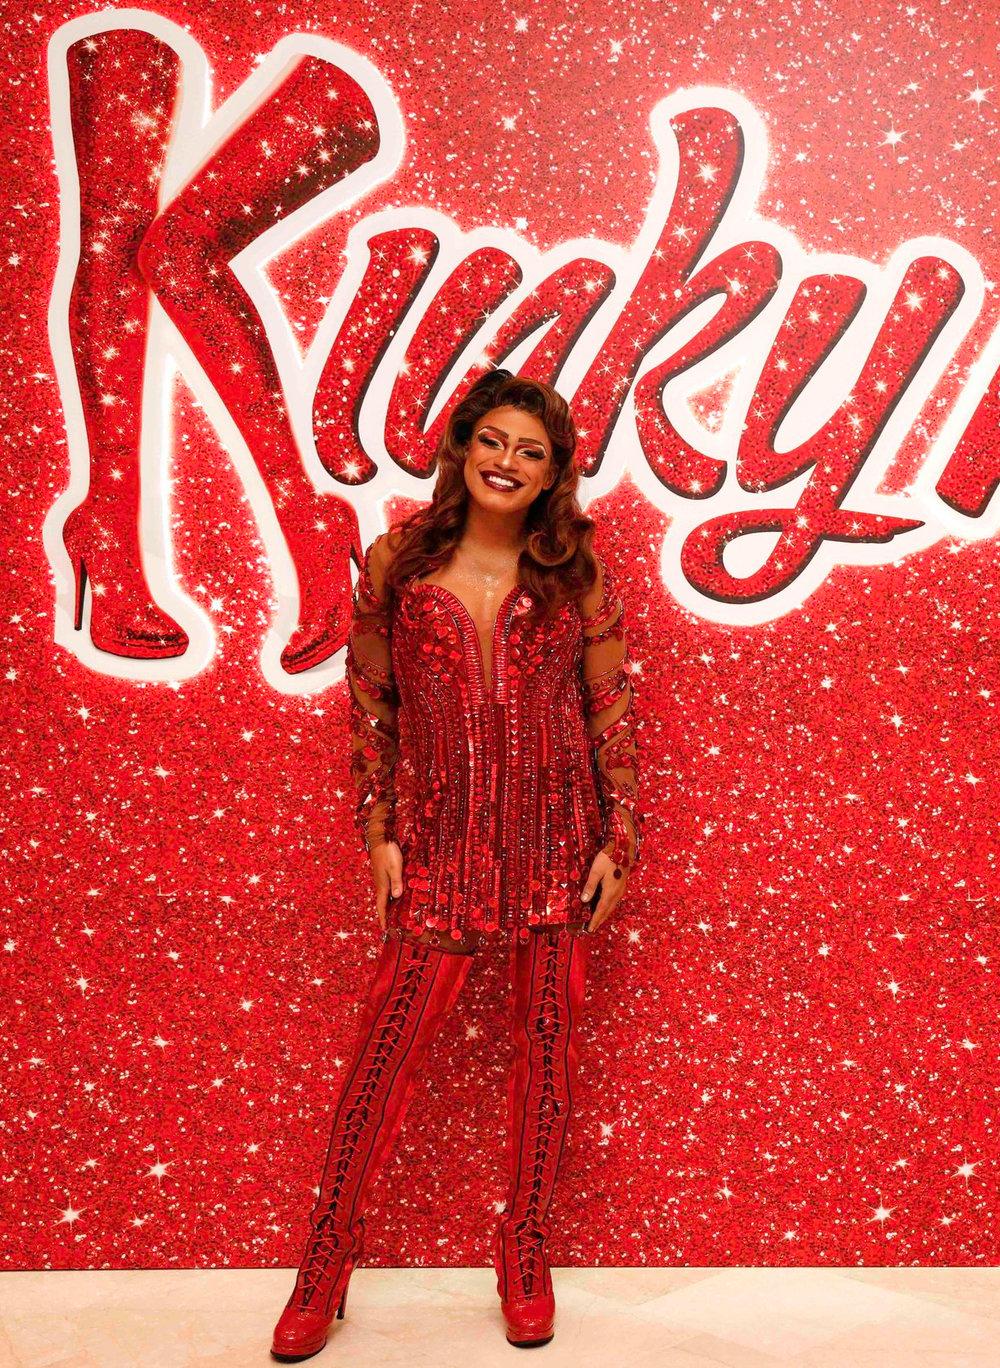 Kinky Boots Social Media Photo Shoot 101018-1.JPG